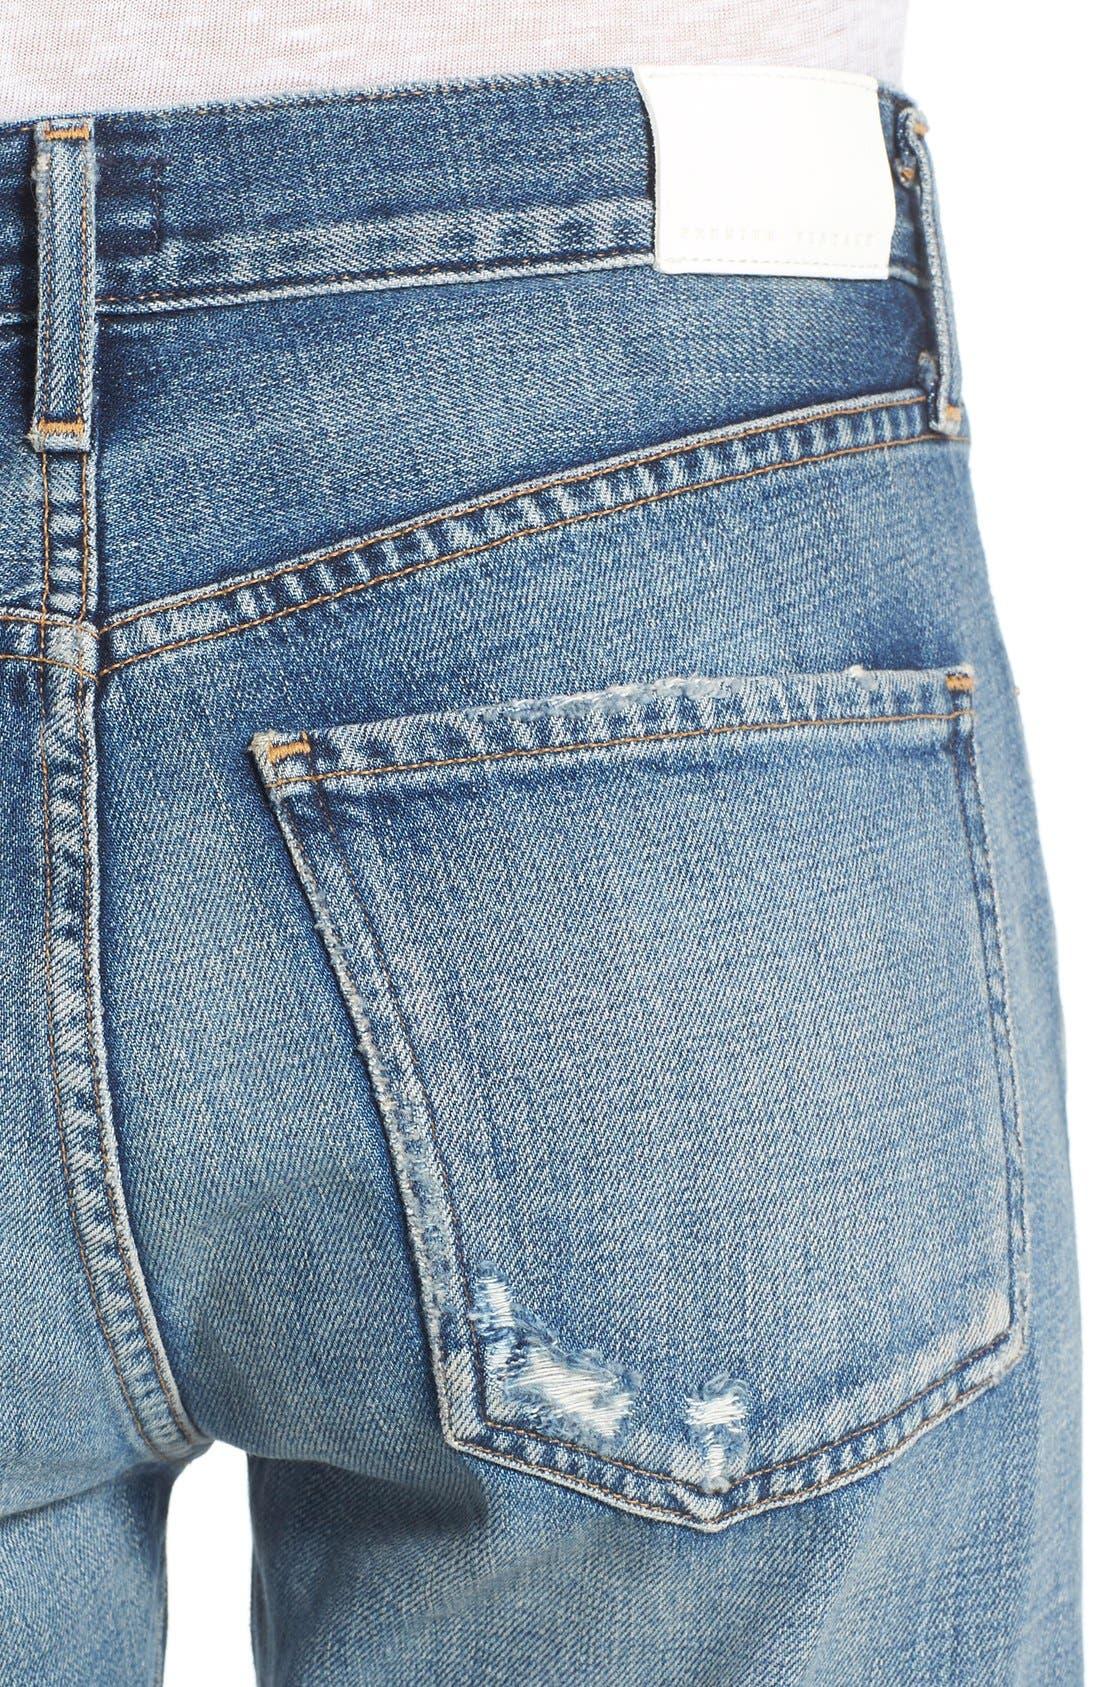 Alternate Image 4  - Citizens of Humanity Liya High Waist Slim Boyfriend Jeans (Fade Out)